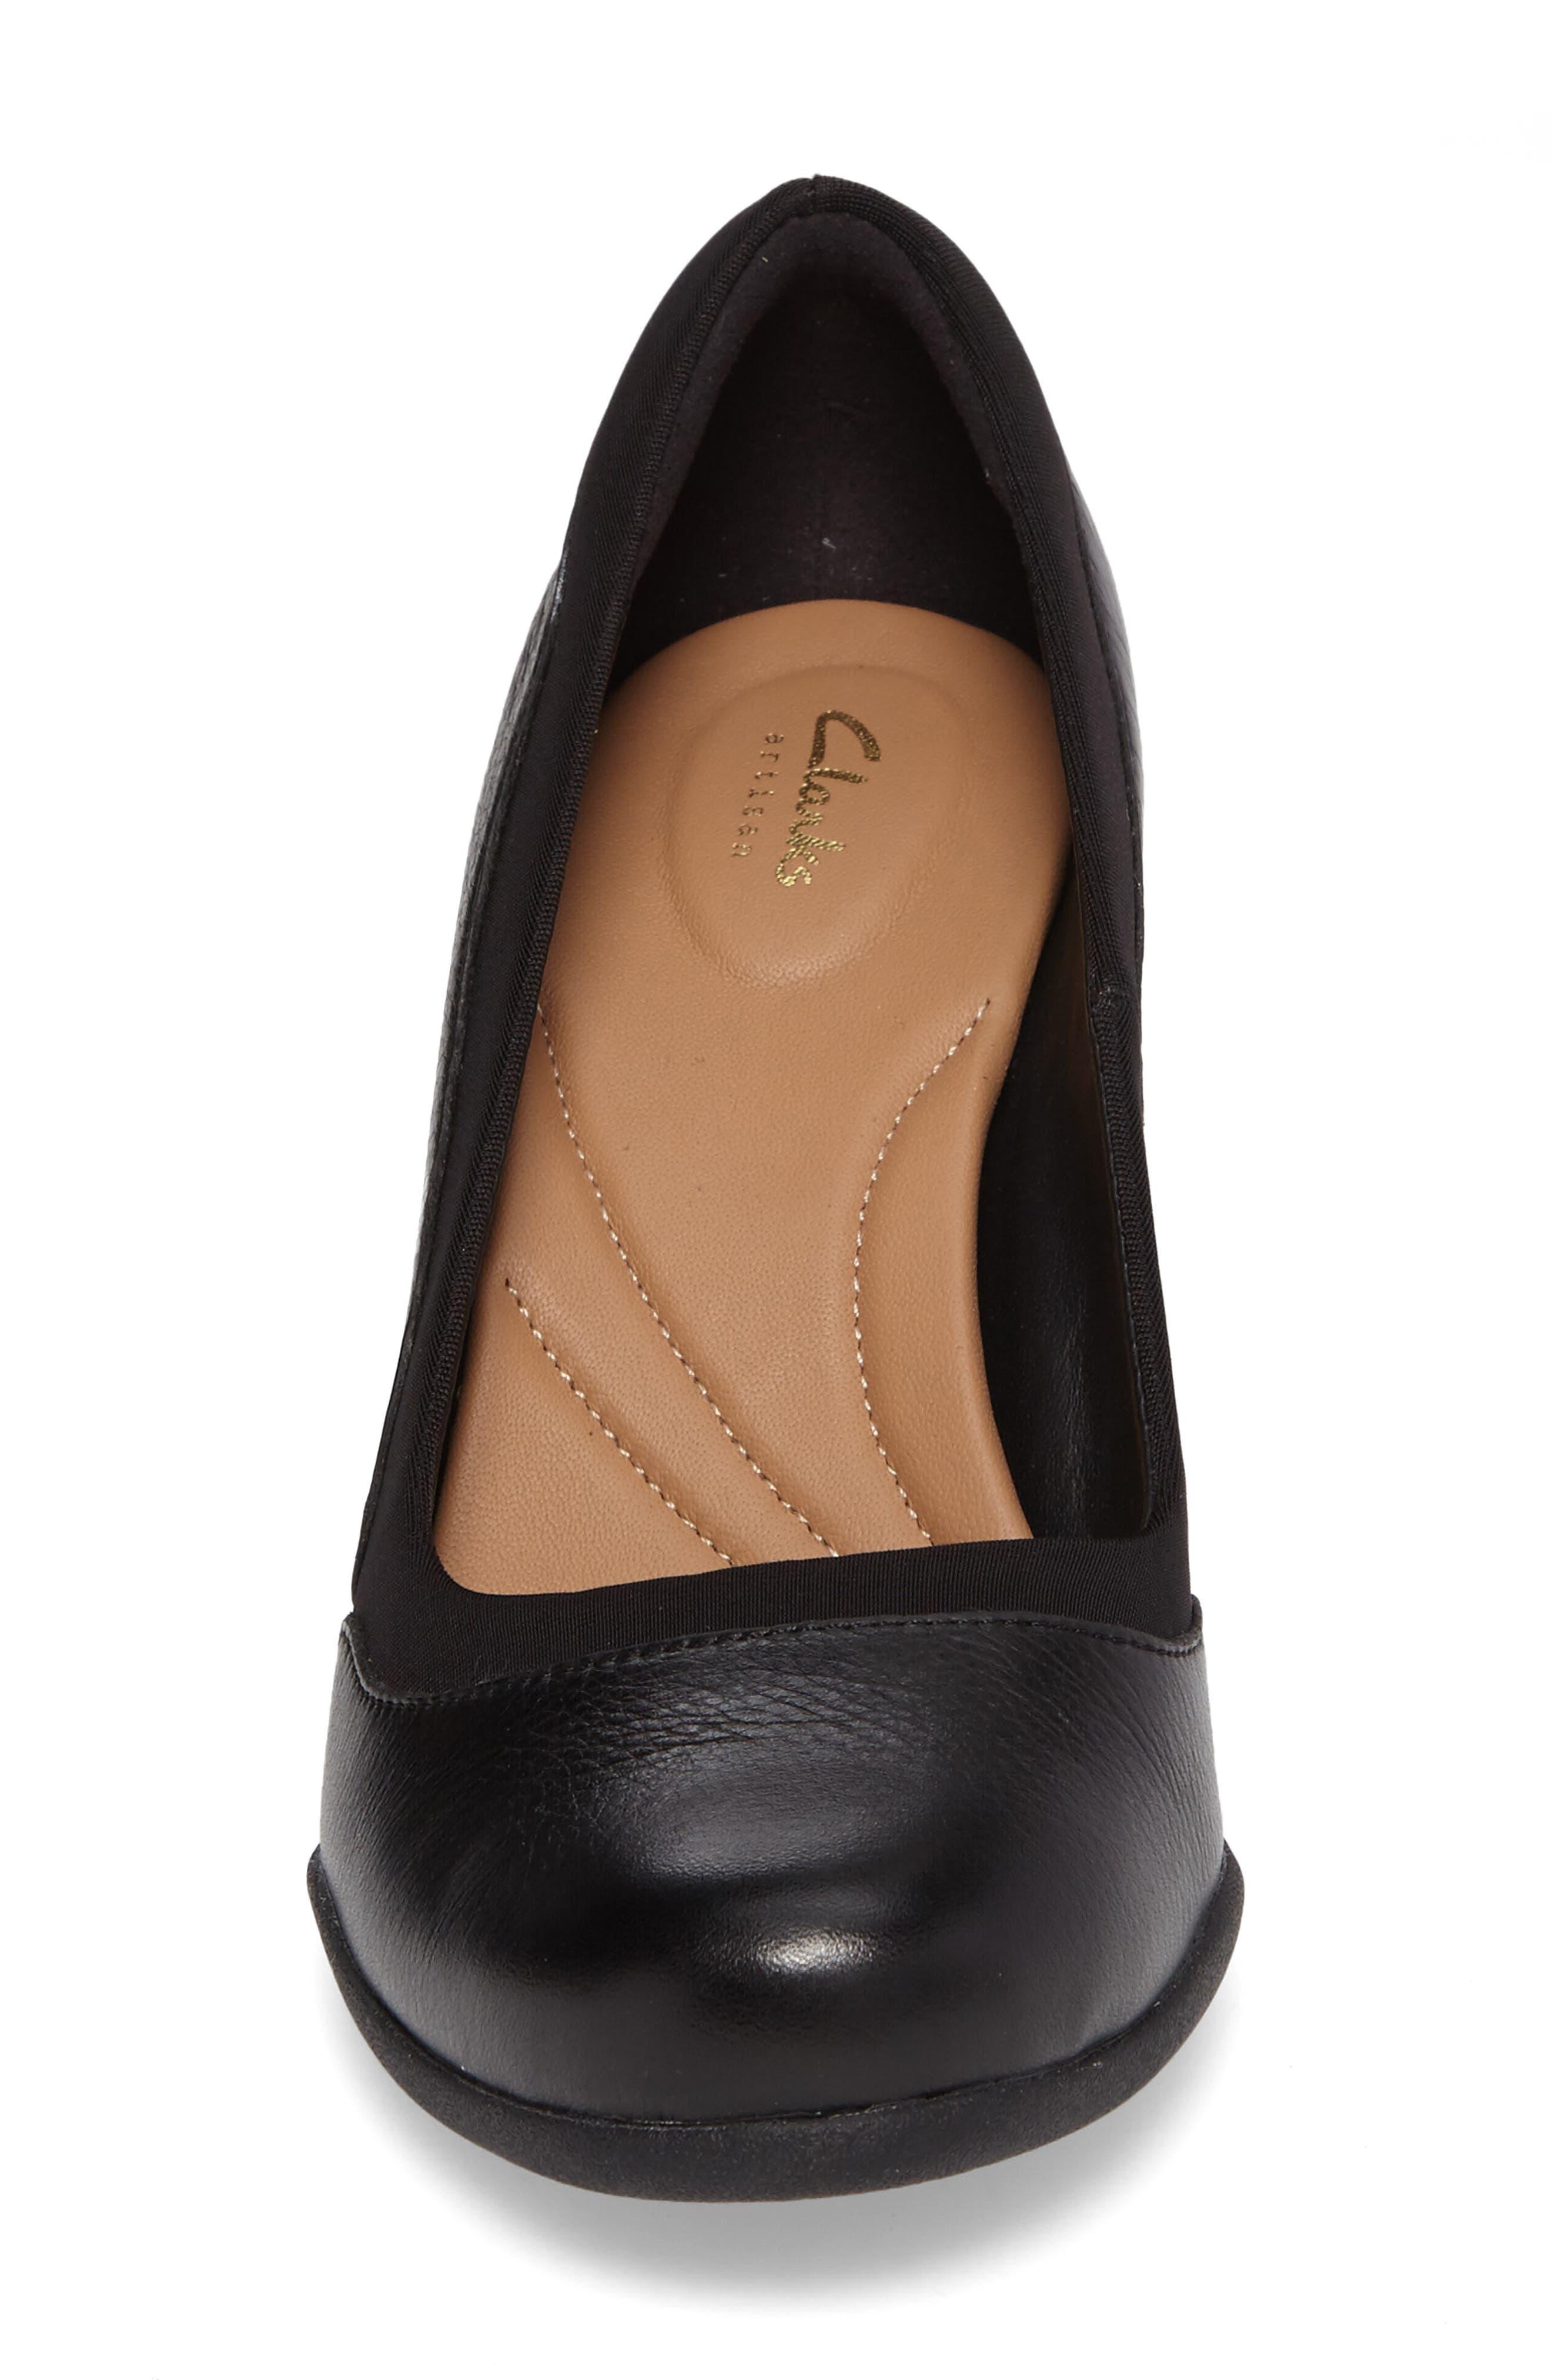 Ayda Maia Pump,                             Alternate thumbnail 4, color,                             Black Leather